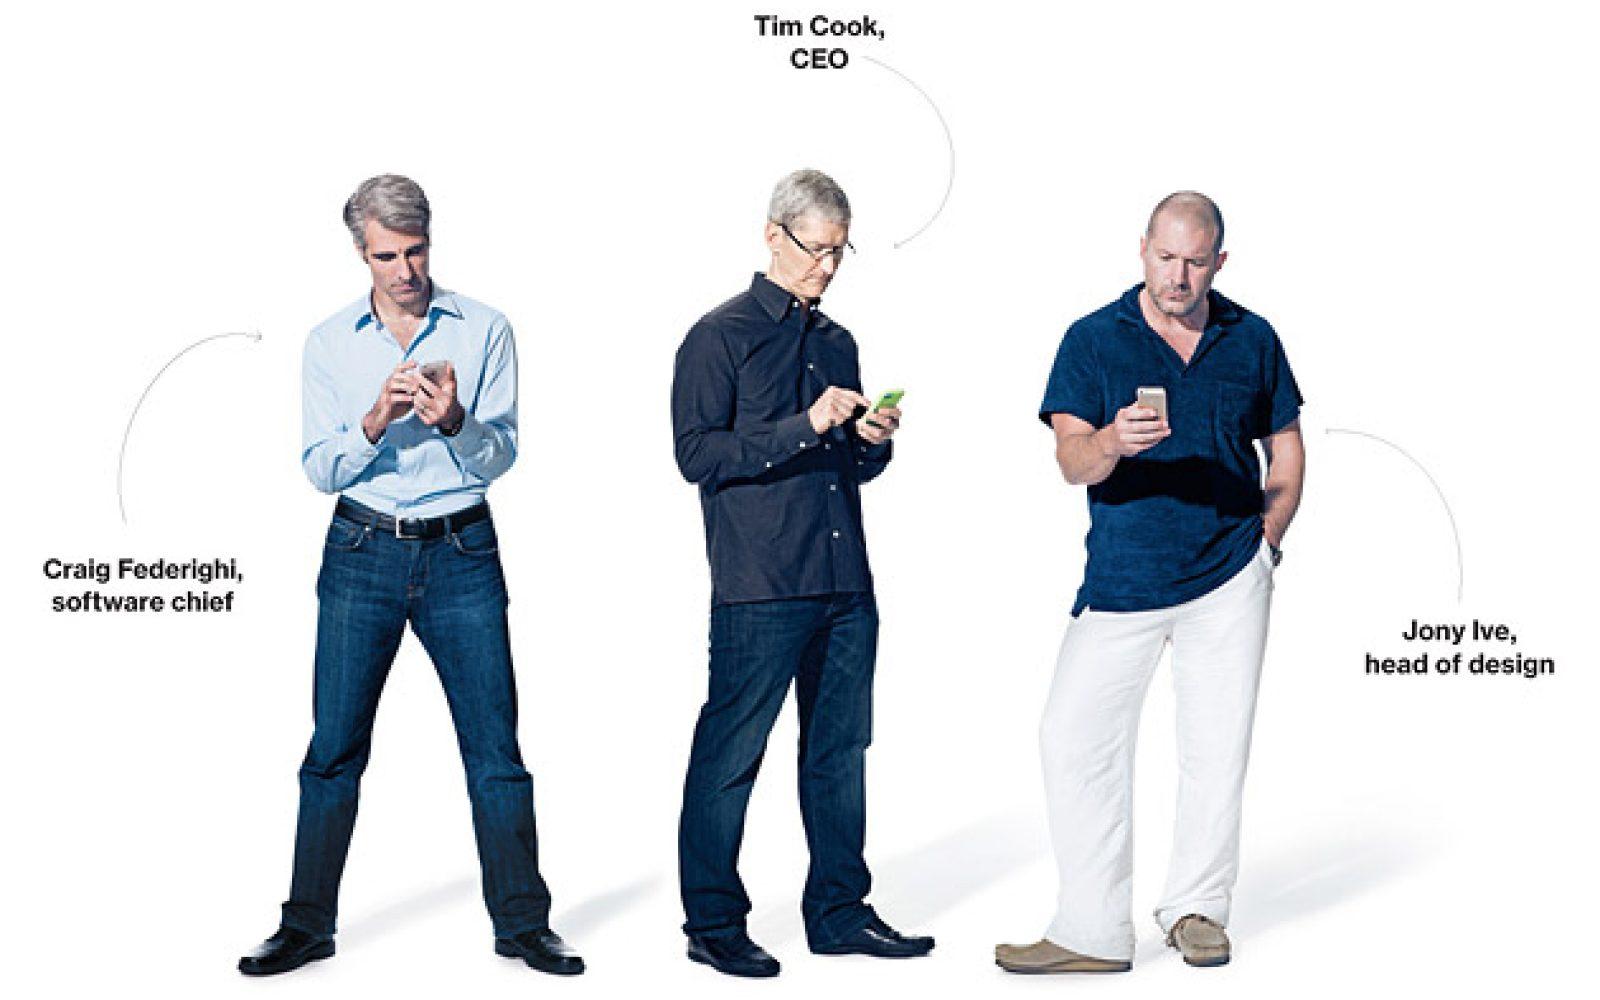 Tim Cook, Jony Ive, Craig Federighi talk new iPhones, iOS 7